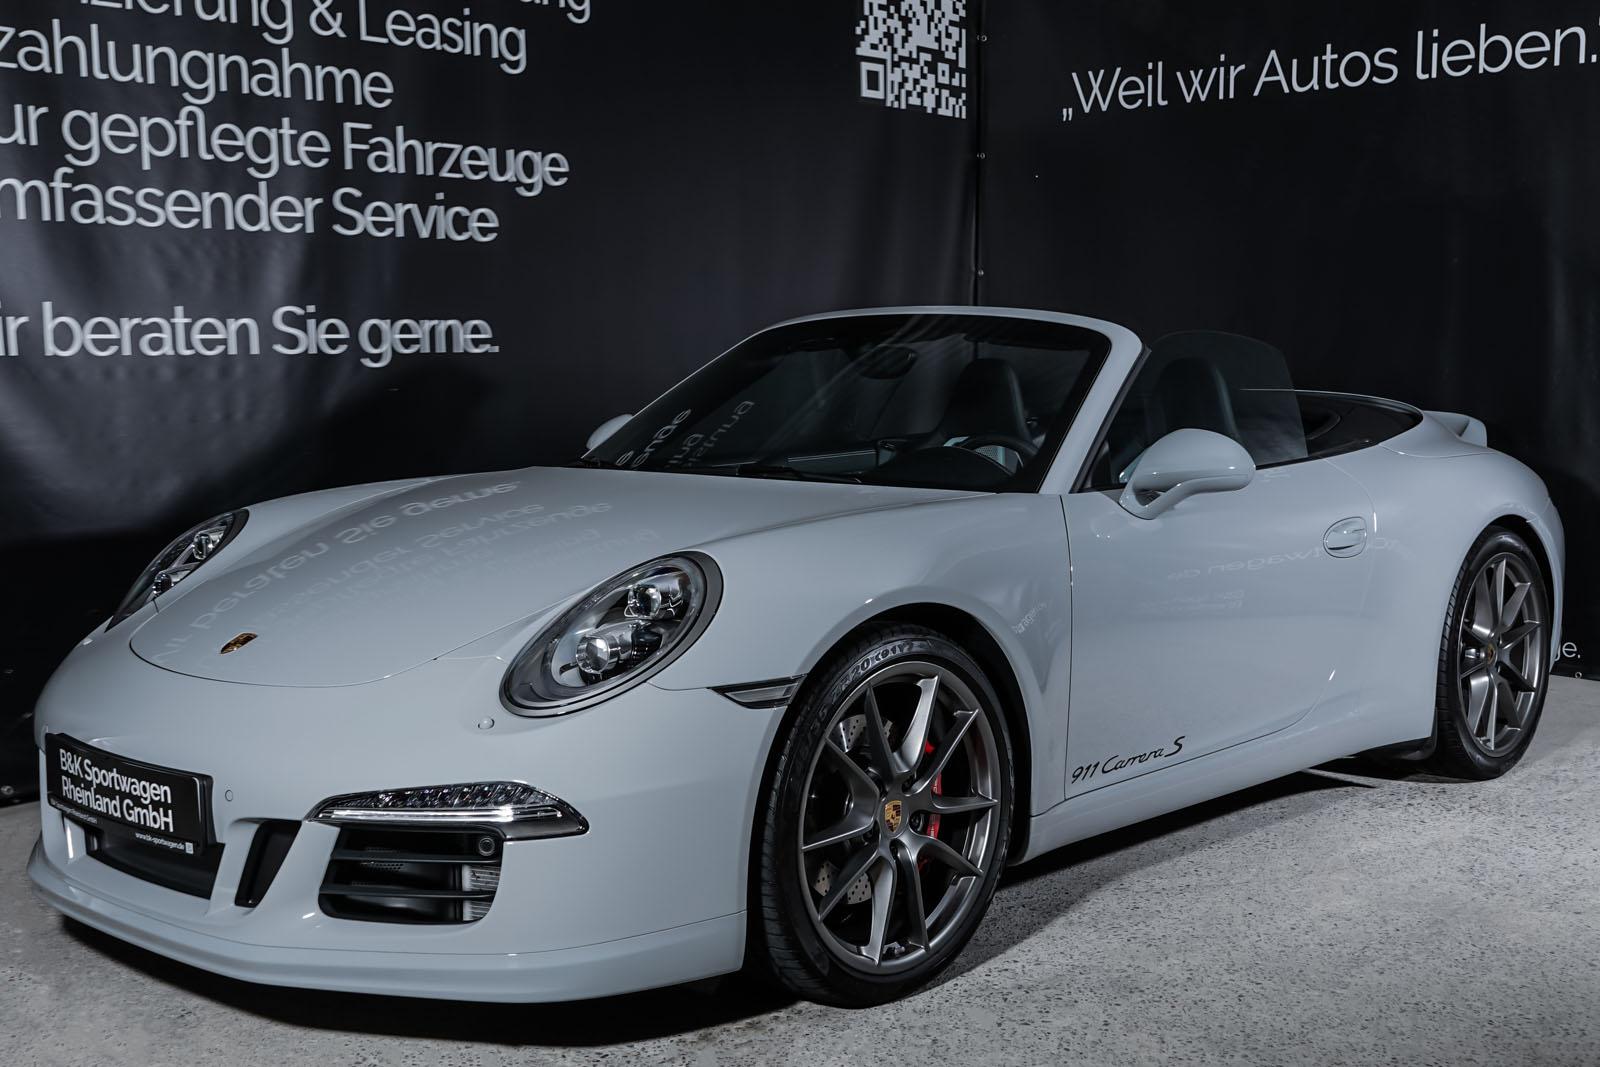 Porsche_991_C2S_Cabrio_Grigiocampovolo_Schwarz_POR-4558_7_w